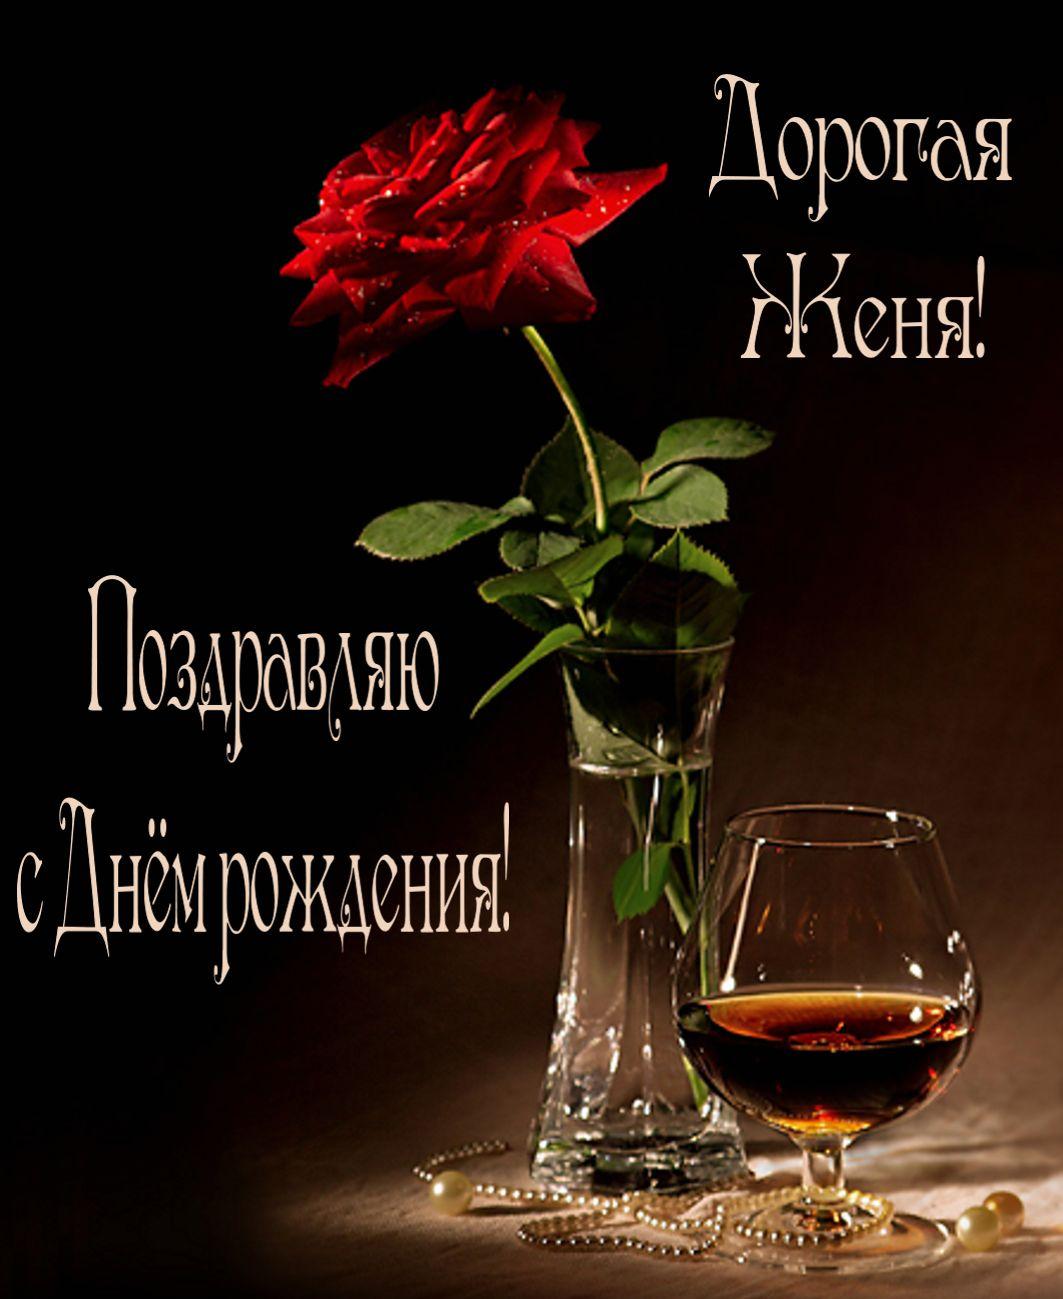 Открытка - красивая роза с бокалом вина на темном фоне